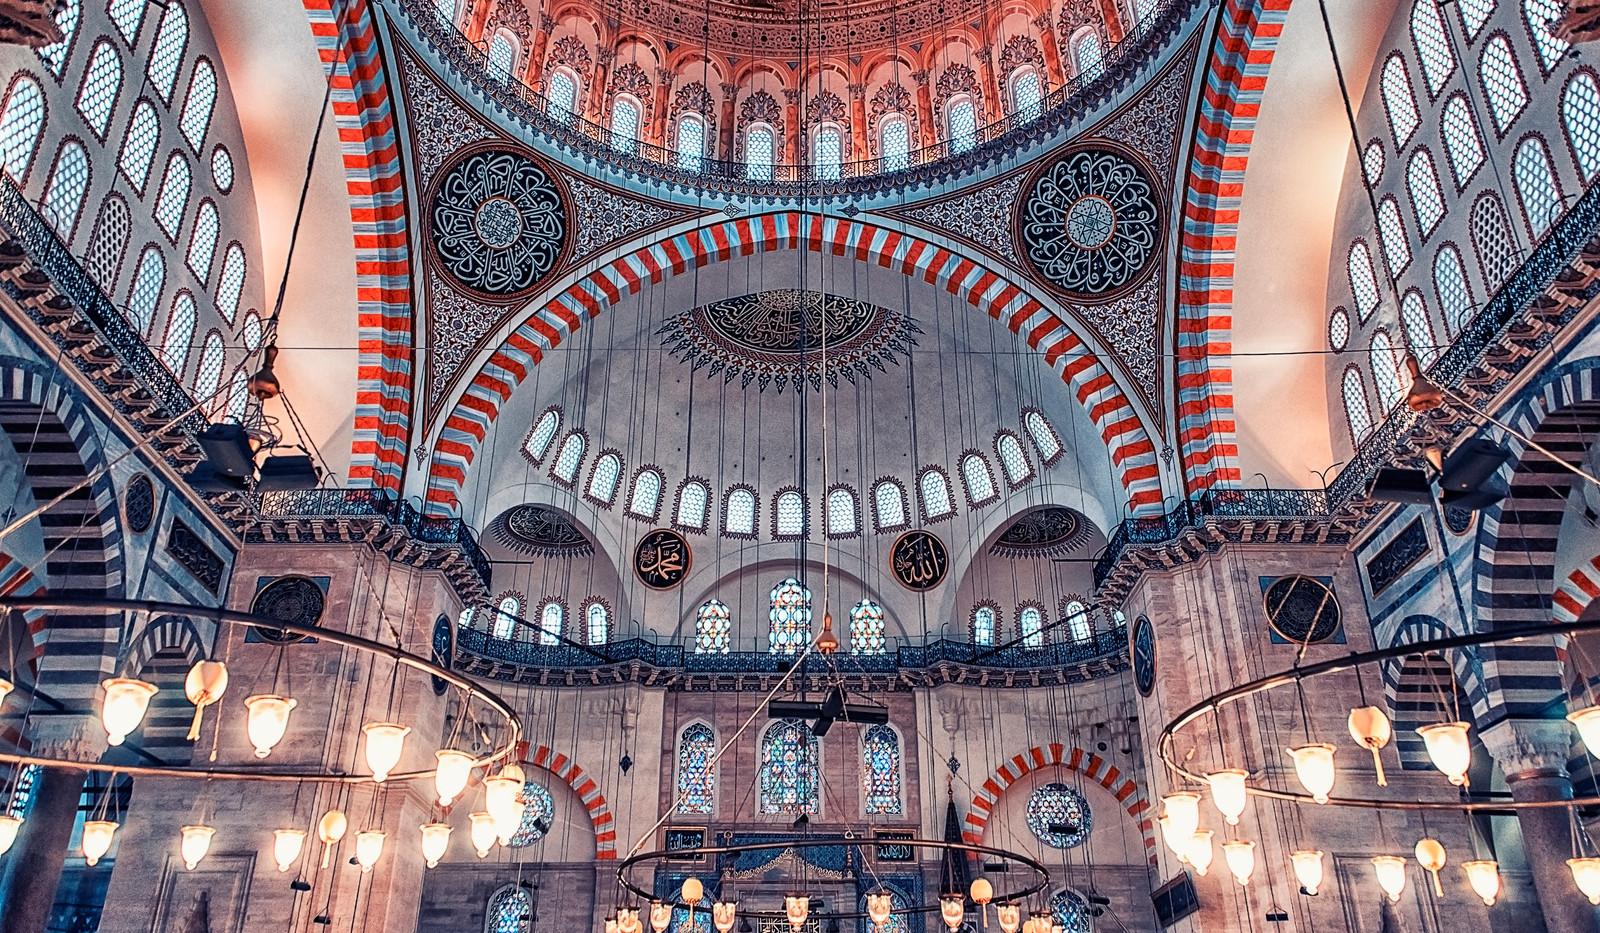 Canva - Ceiling of the Suleymaniye Camii